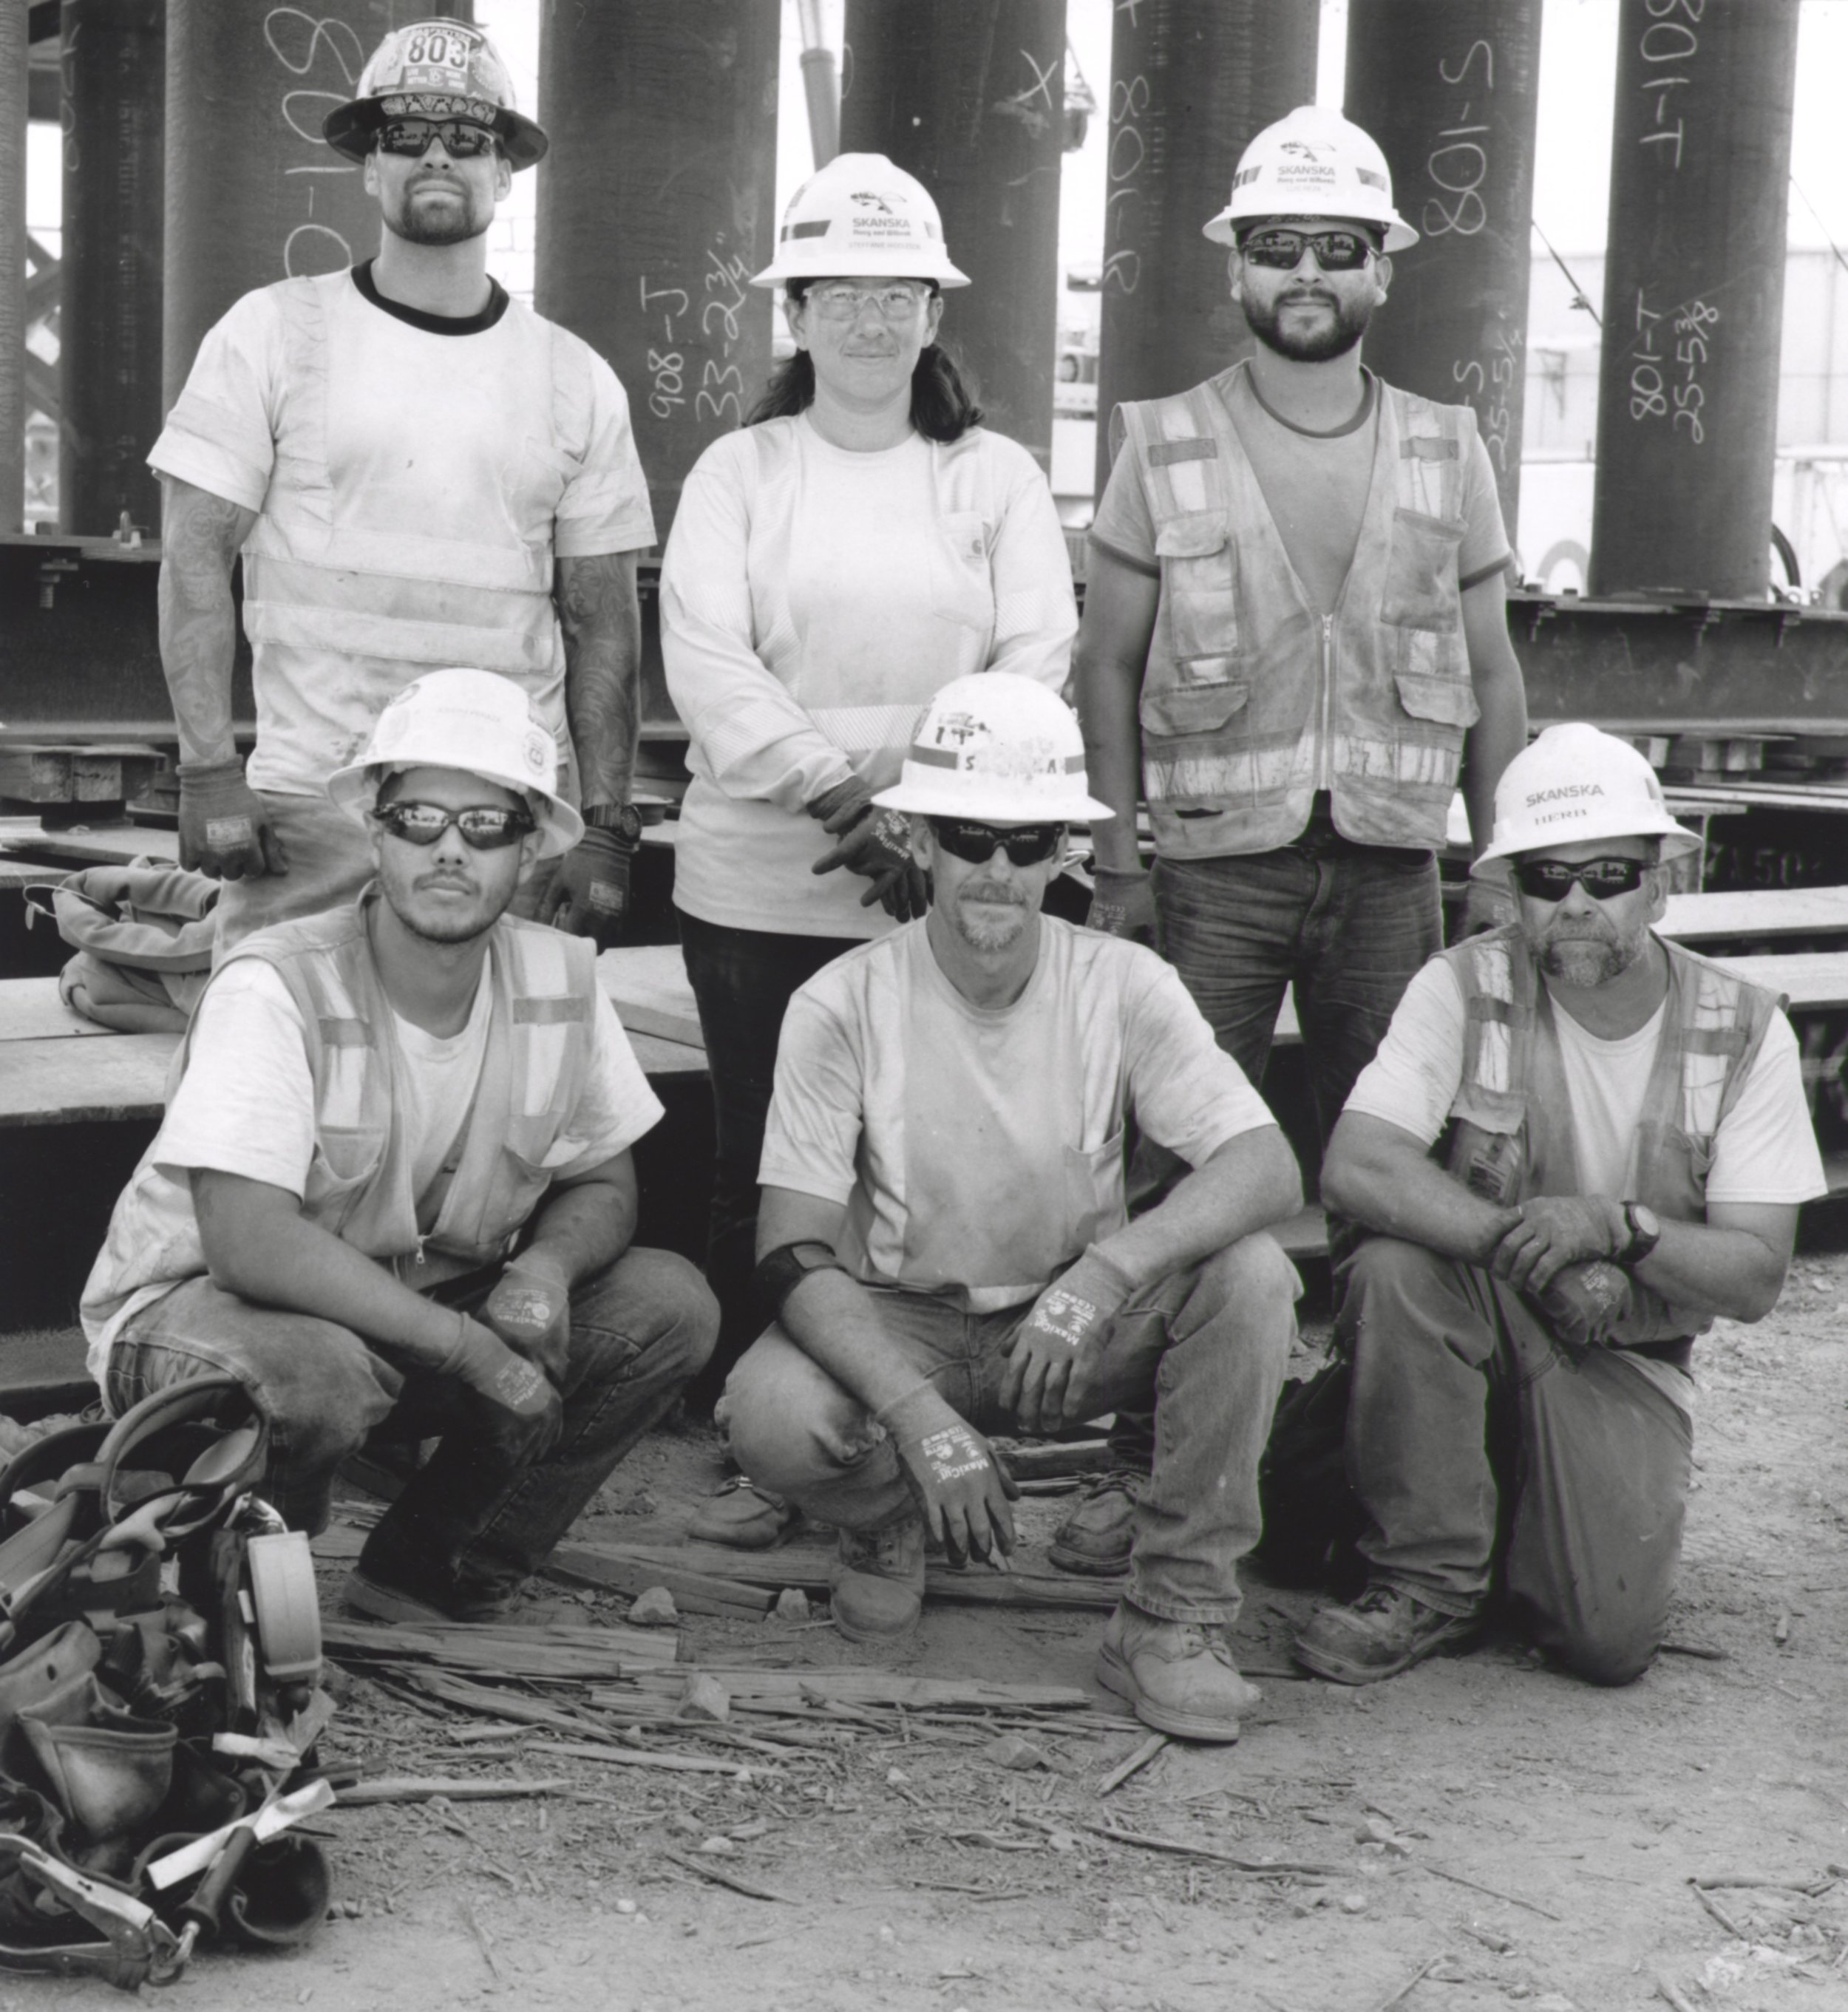 Carpenters Group Photo - 2018